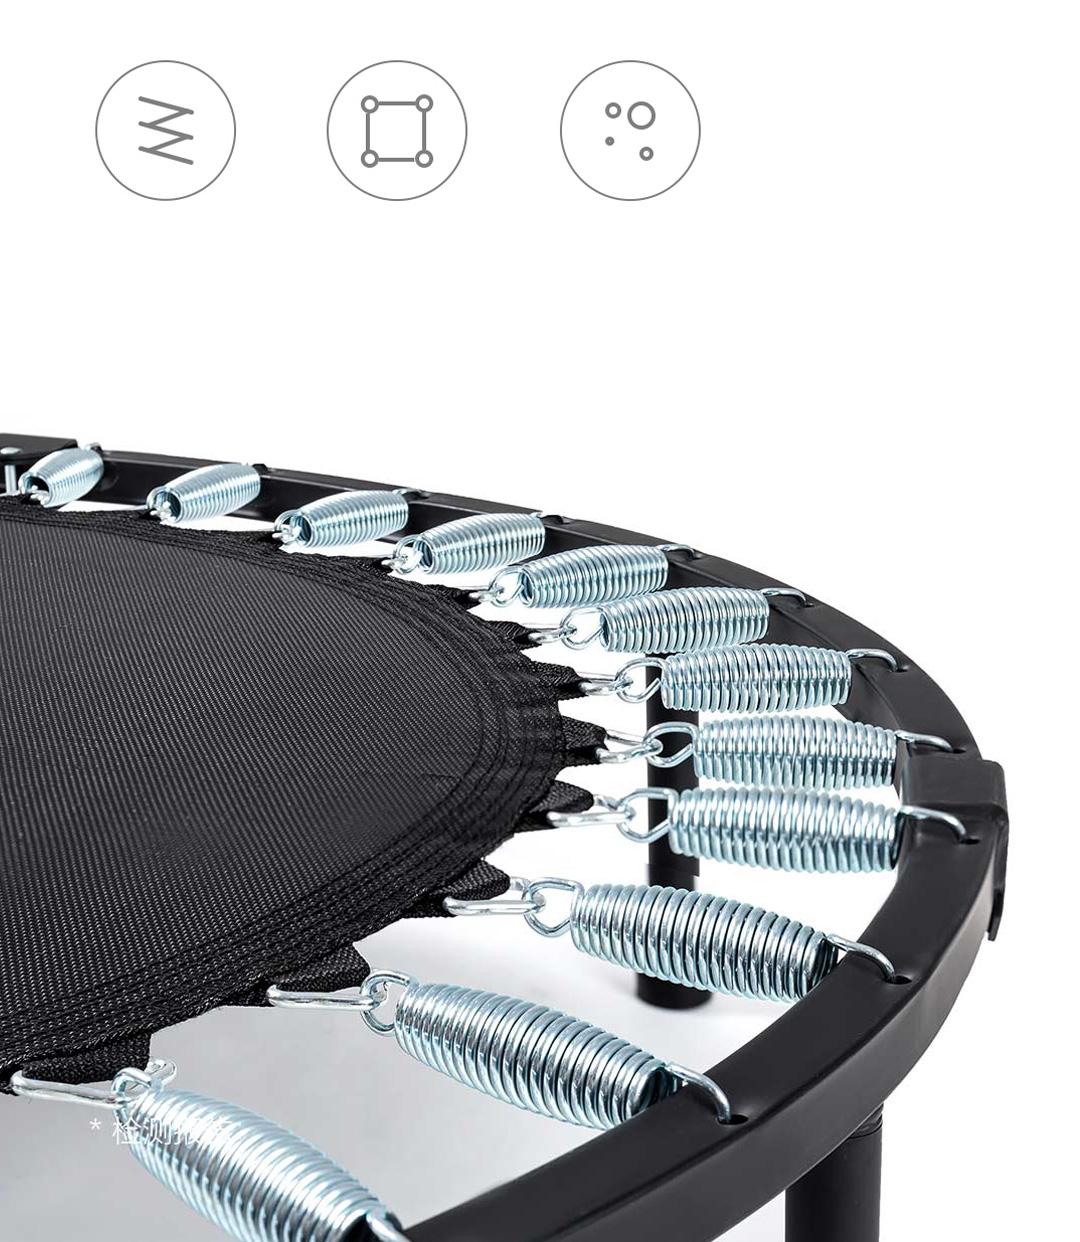 Xiaomi ZaoFeng Foldable Fitness Trampoline